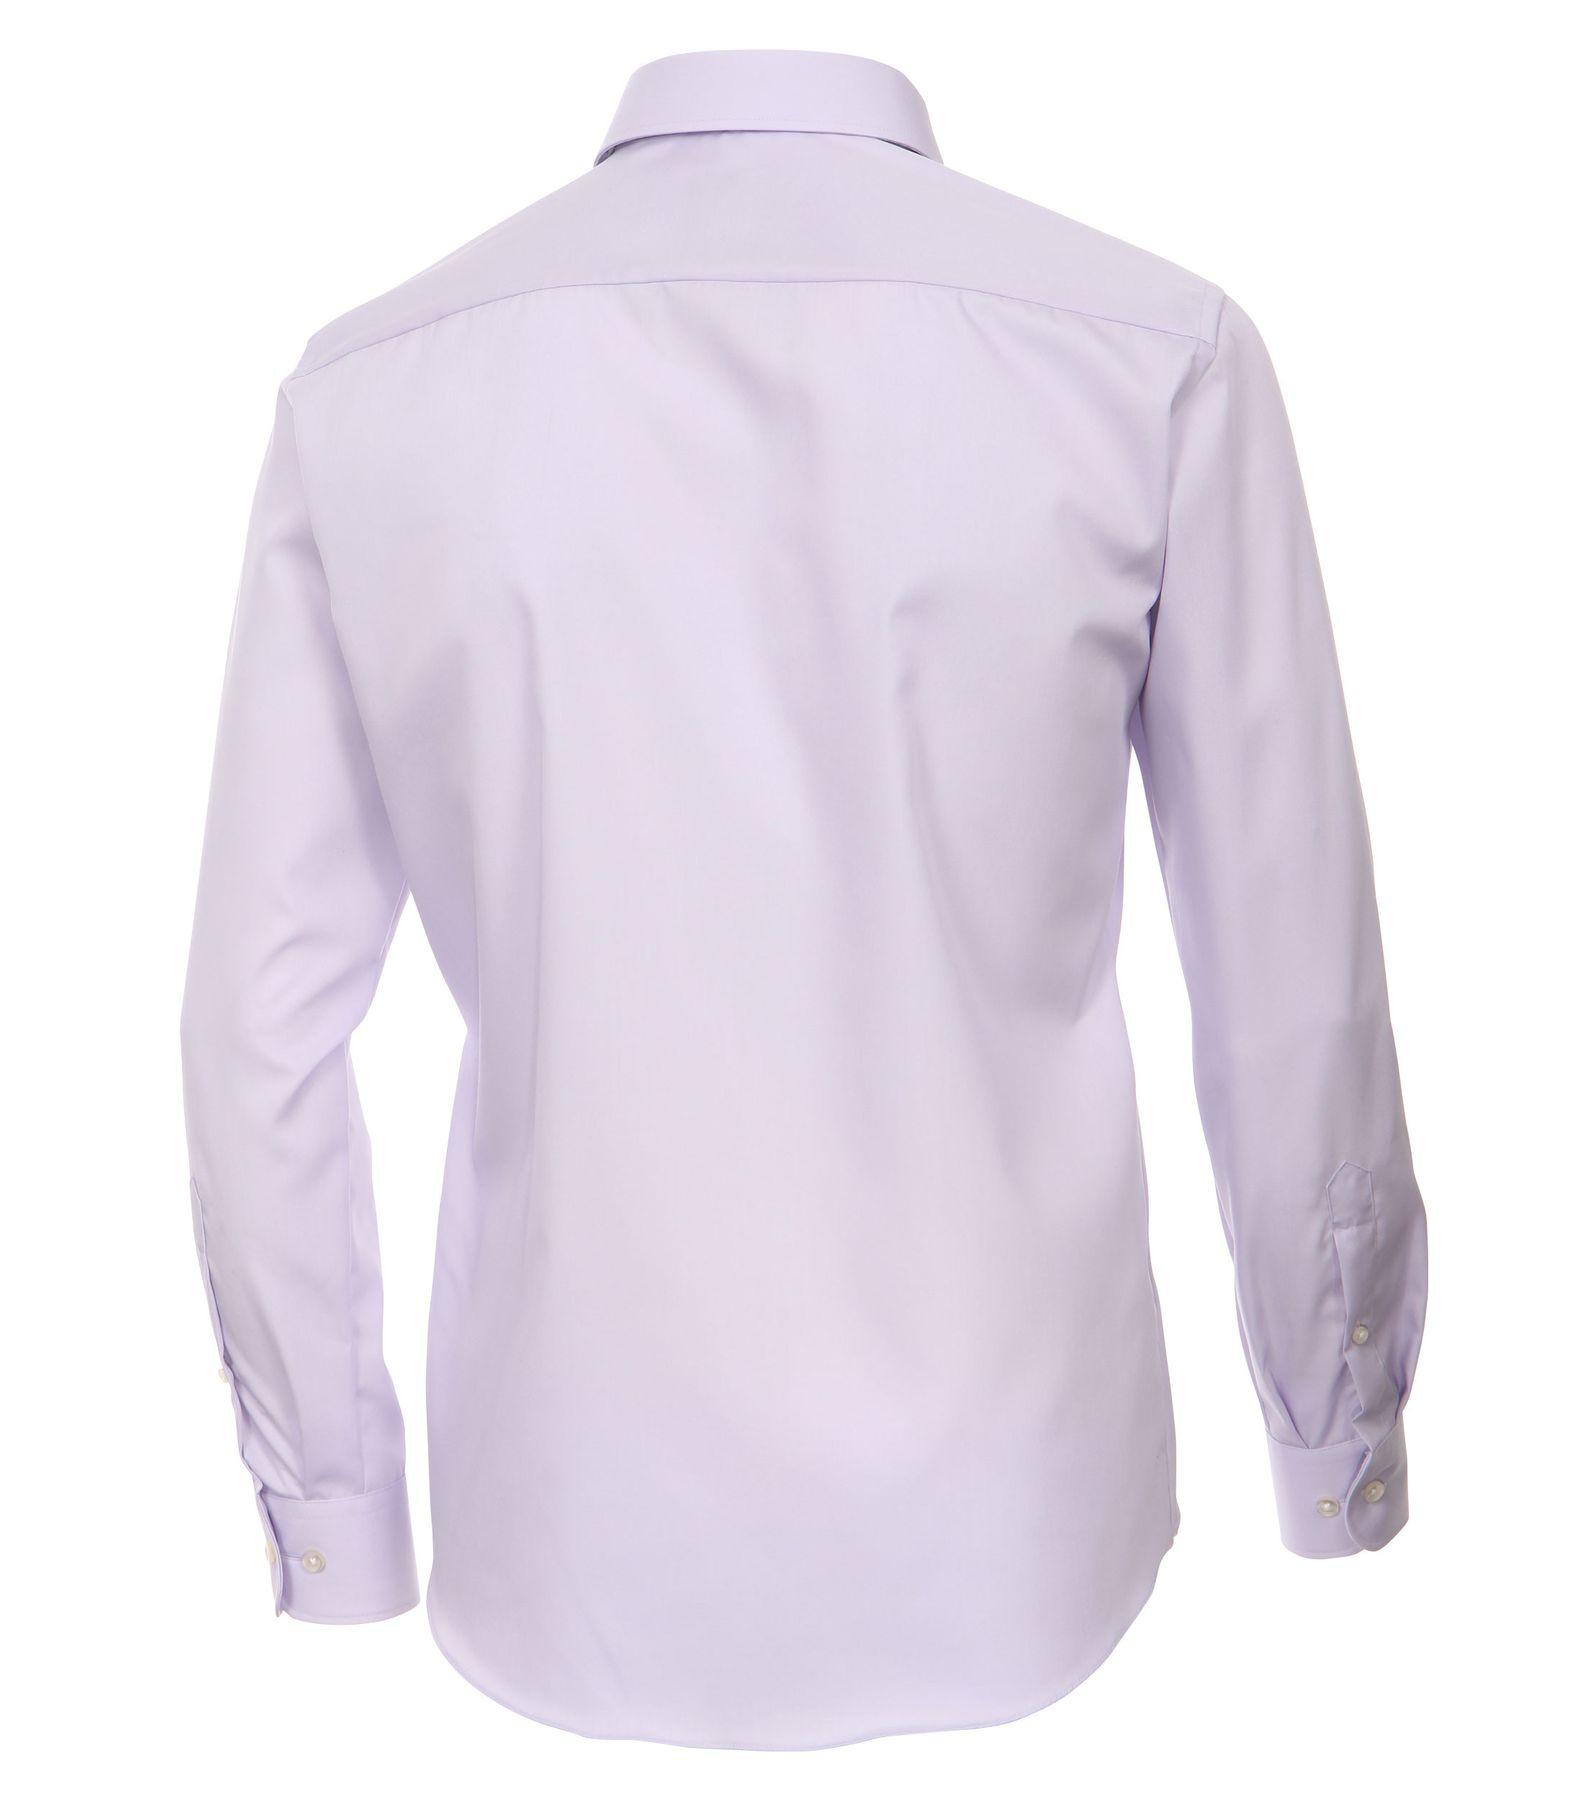 Casa Moda - Modern Fit - Bügelfreies Herren Business langarm Hemd in verschiedene Farben (006550) – Bild 2